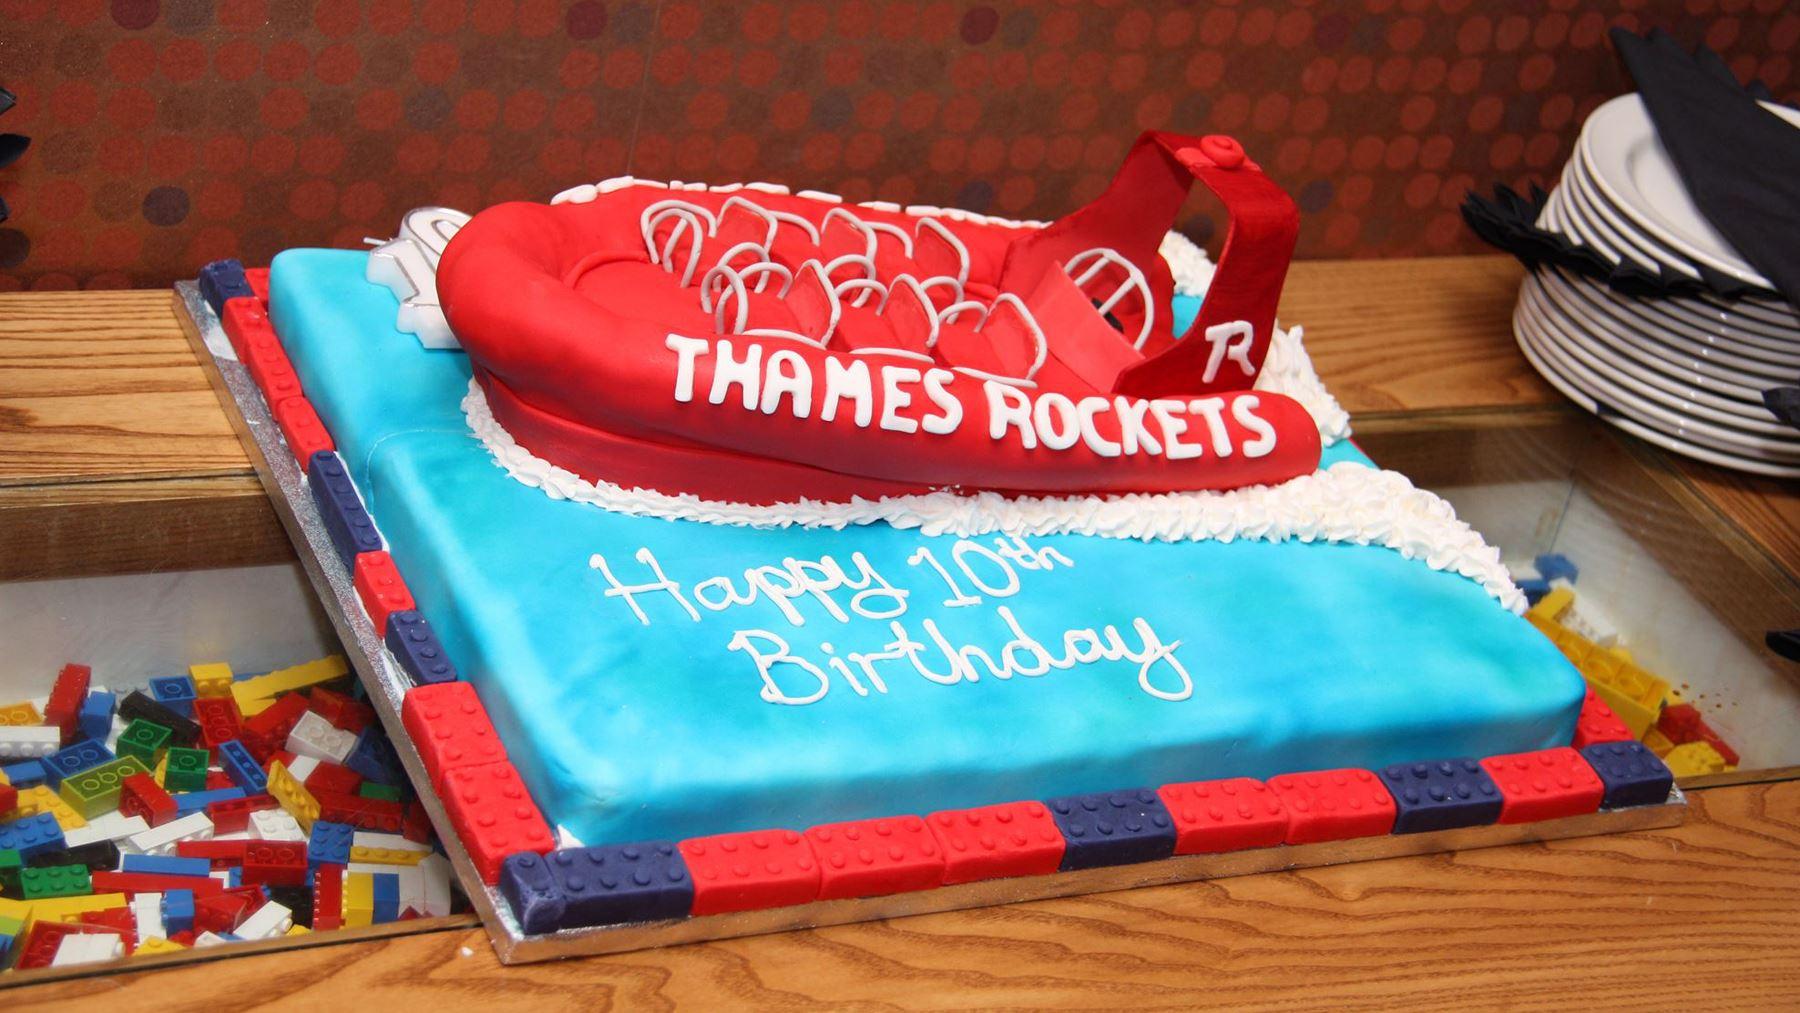 We've Been Spoilt - Thames Rockets Gifts!